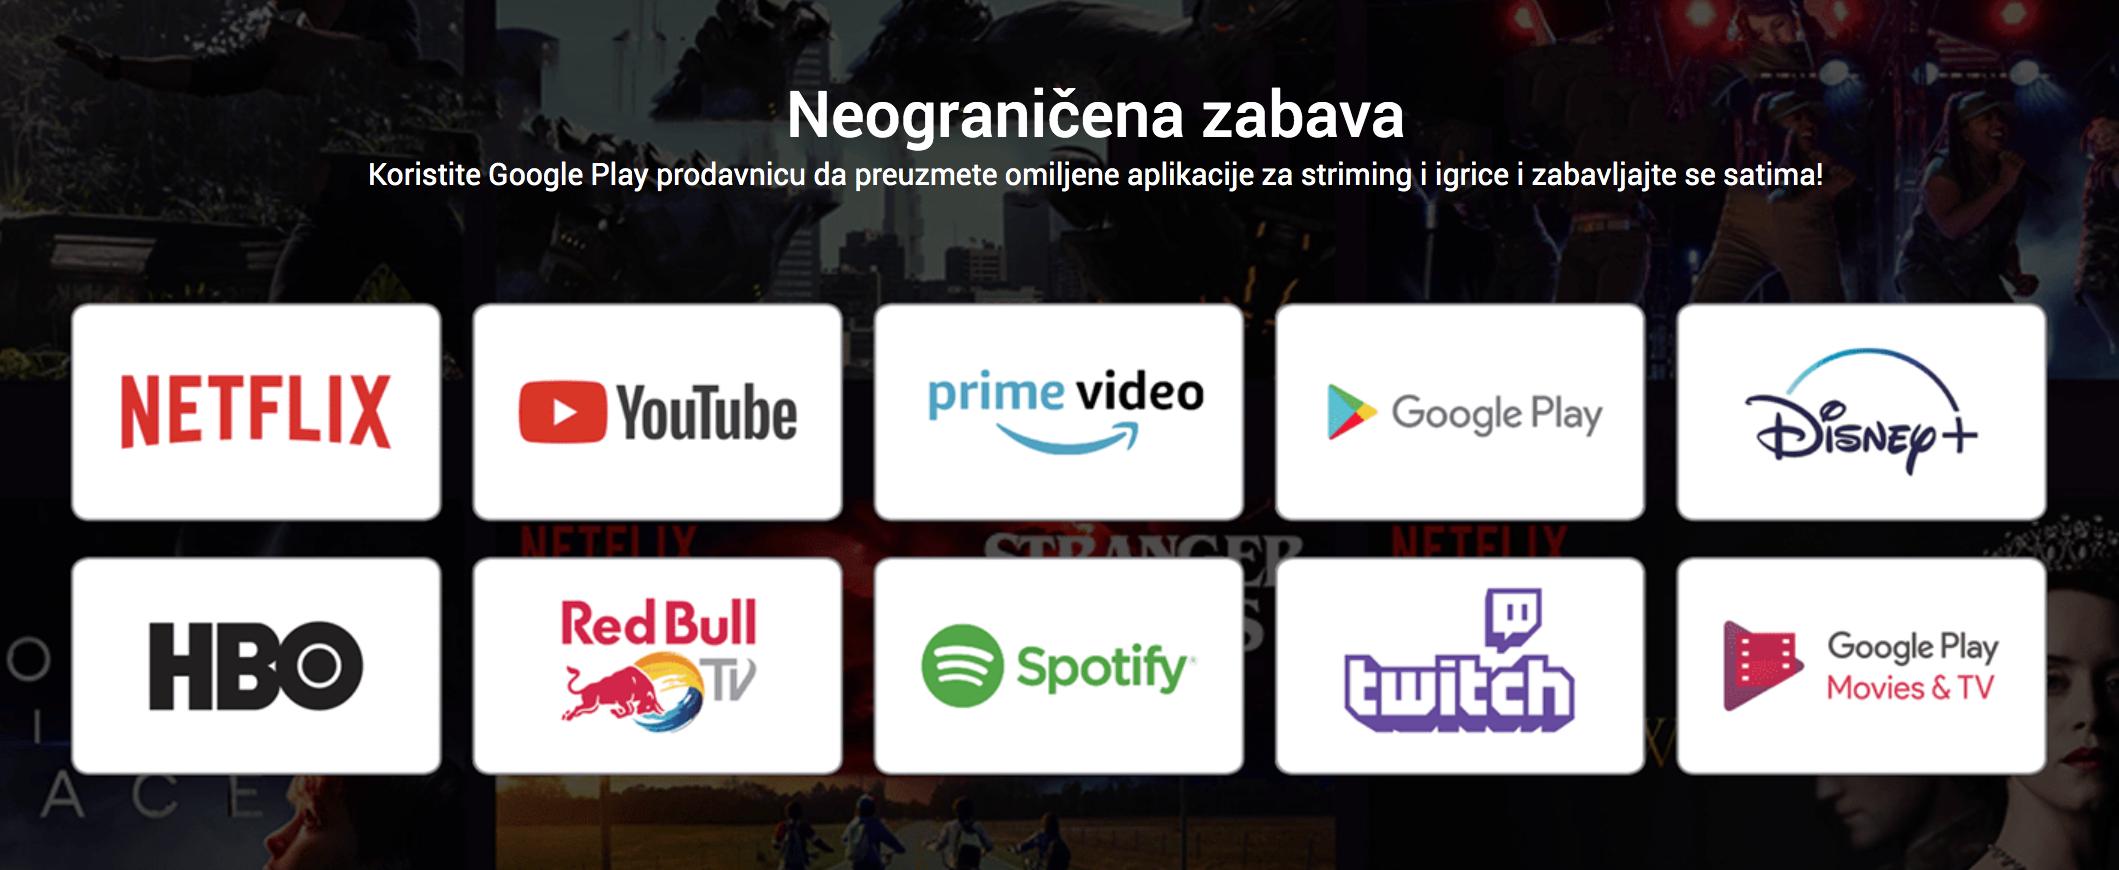 https://mi-srbija.rs/storage/media/2020/11/6/eac85d47-efcc-4115-8958-427886b1c416.png